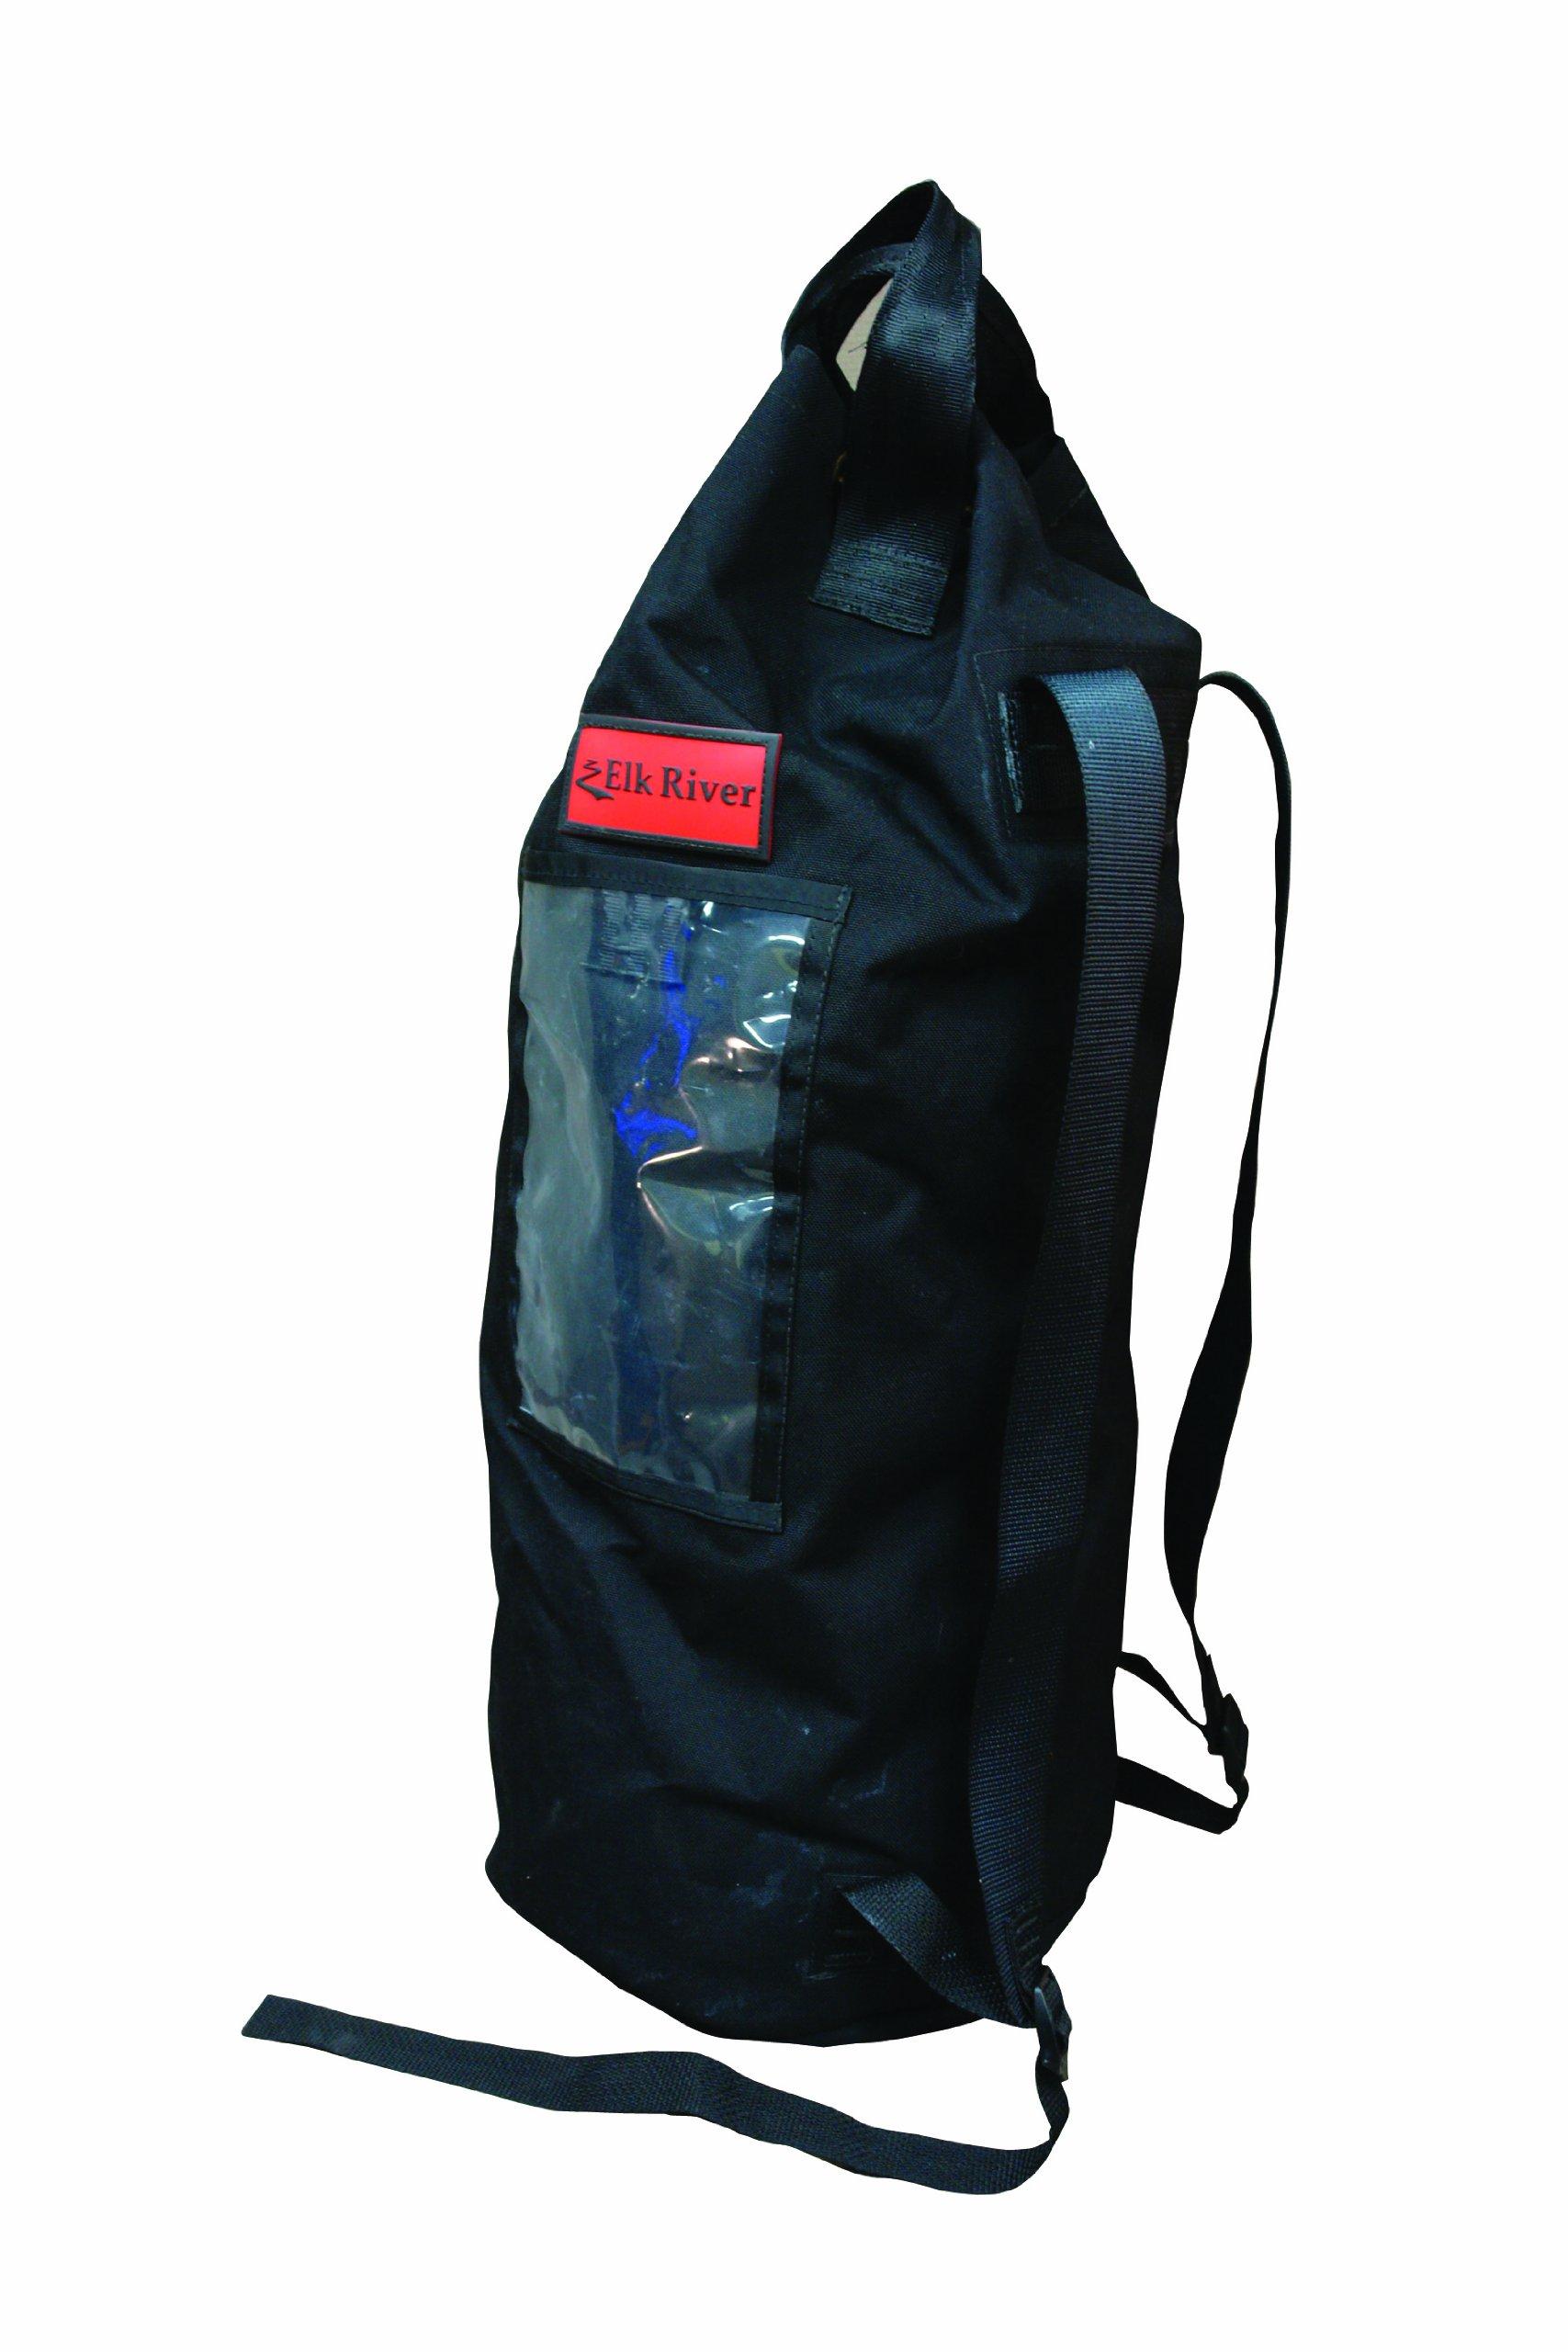 Elk River 84310 EZE-Man Nylon Rope Bag with Drawstring Closure, 12'' Width x 27'' Depth